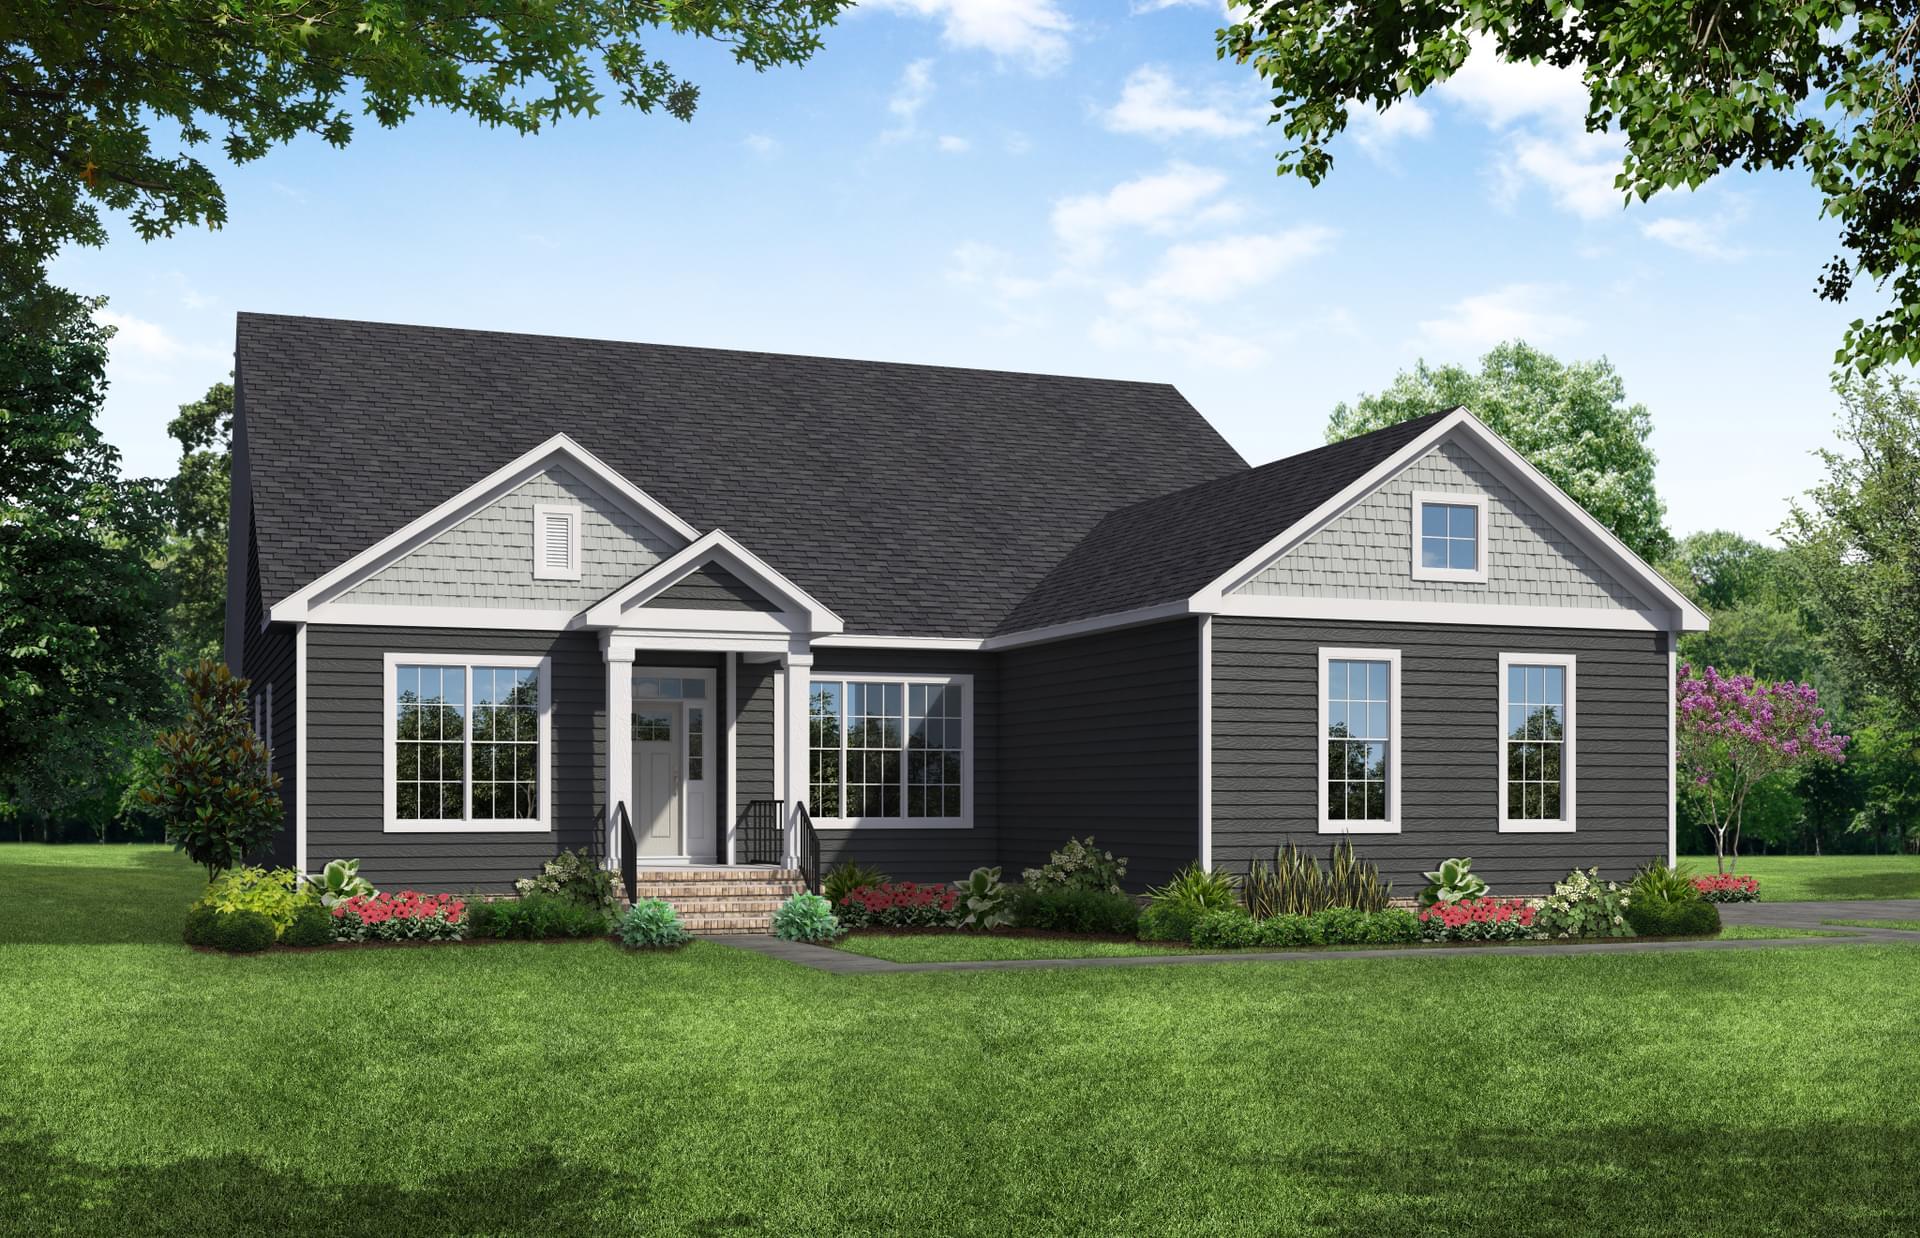 The Wellington II new home in Smithfield VA